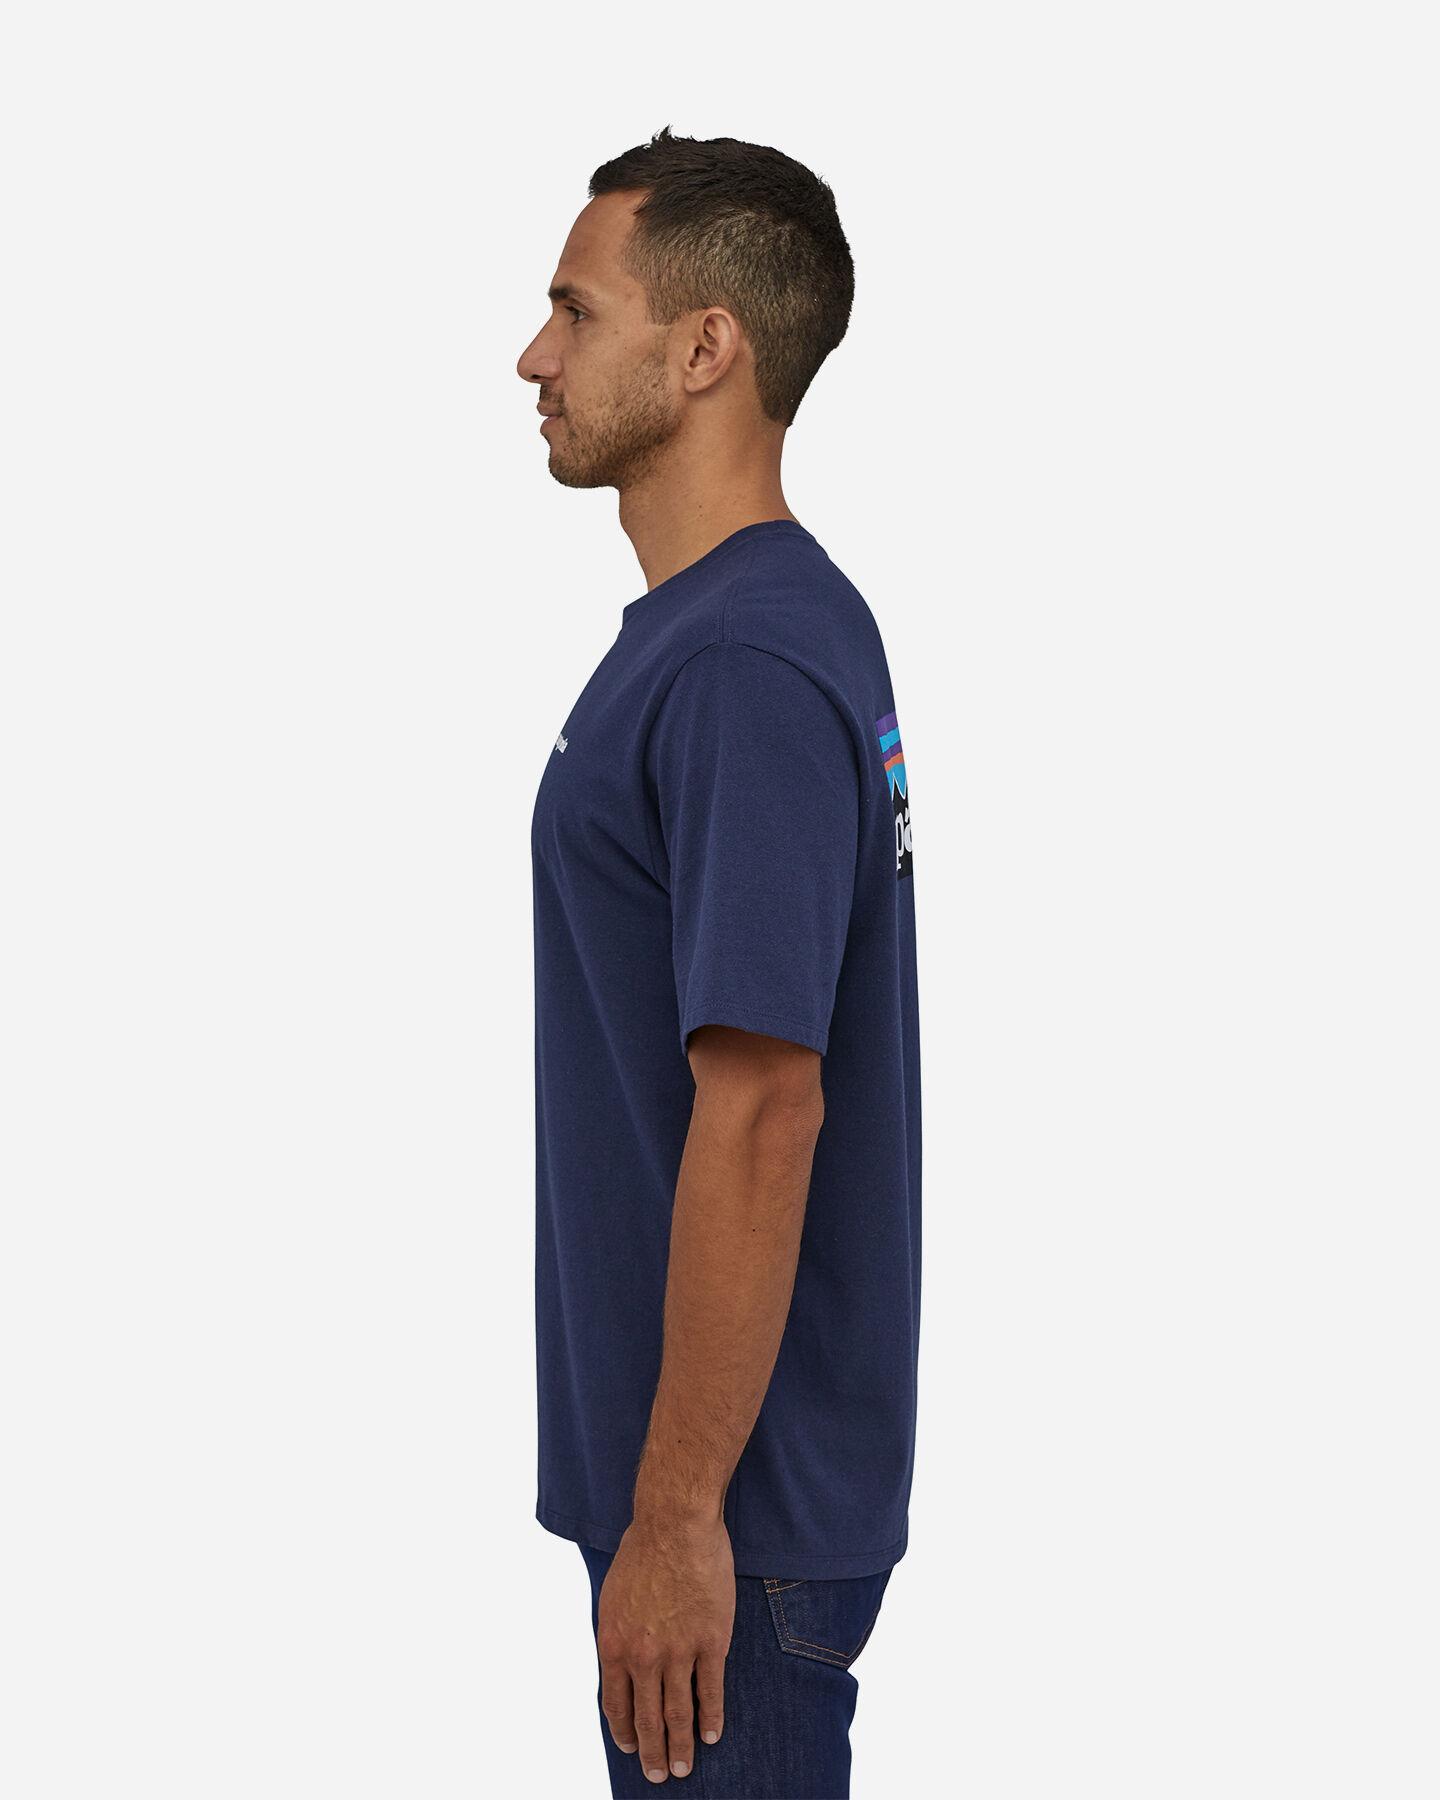 T-Shirt PATAGONIA P-6 LOGO M S4089221 scatto 2